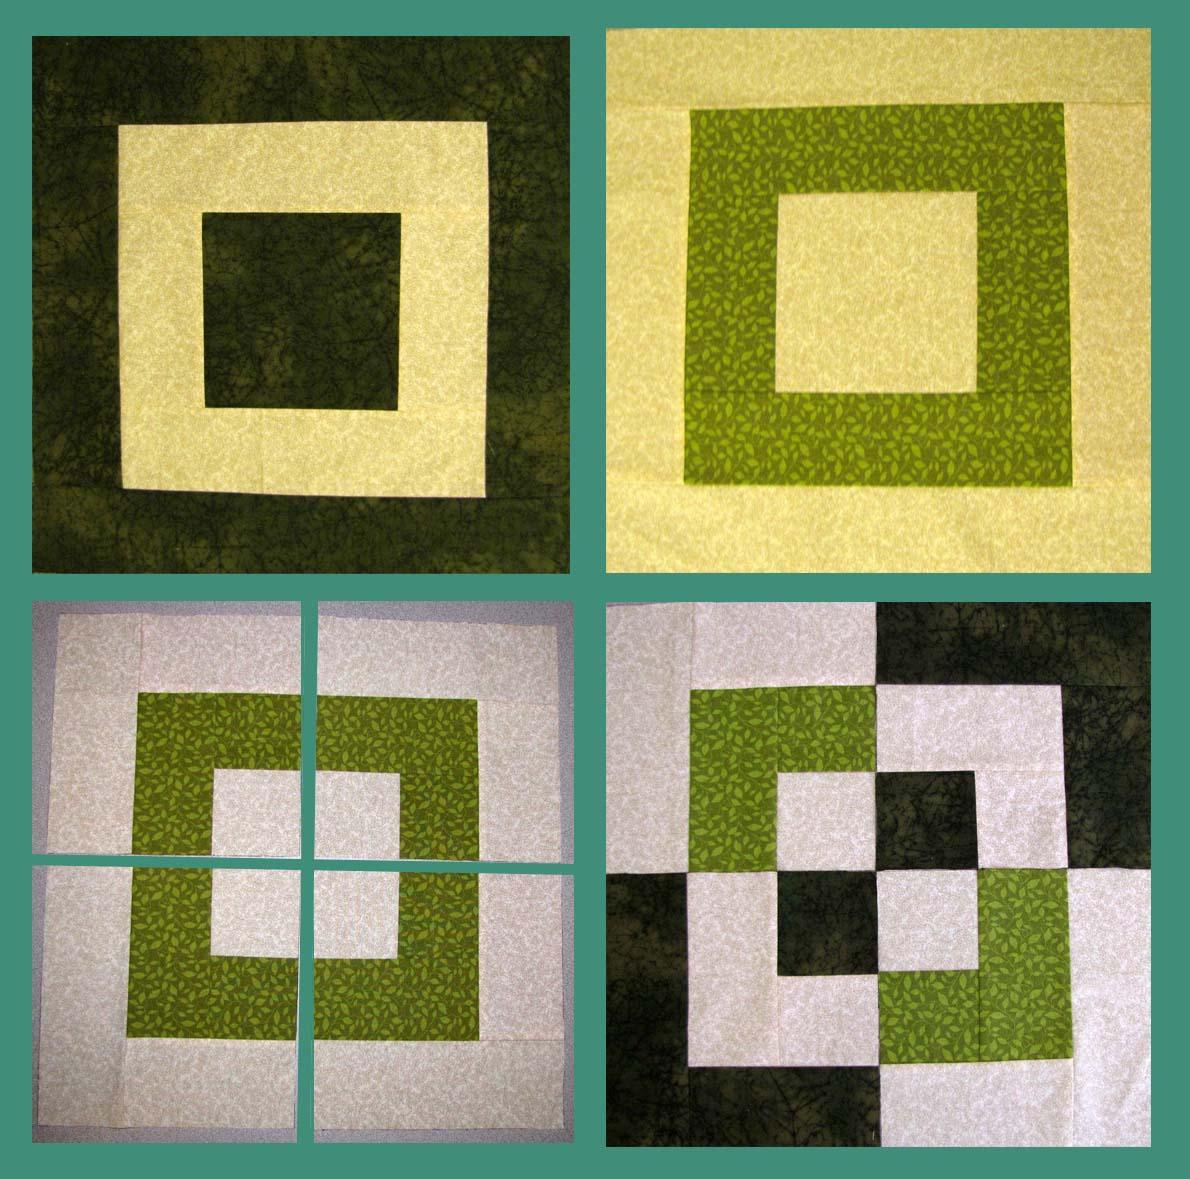 bento box quilts desert colors. Black Bedroom Furniture Sets. Home Design Ideas